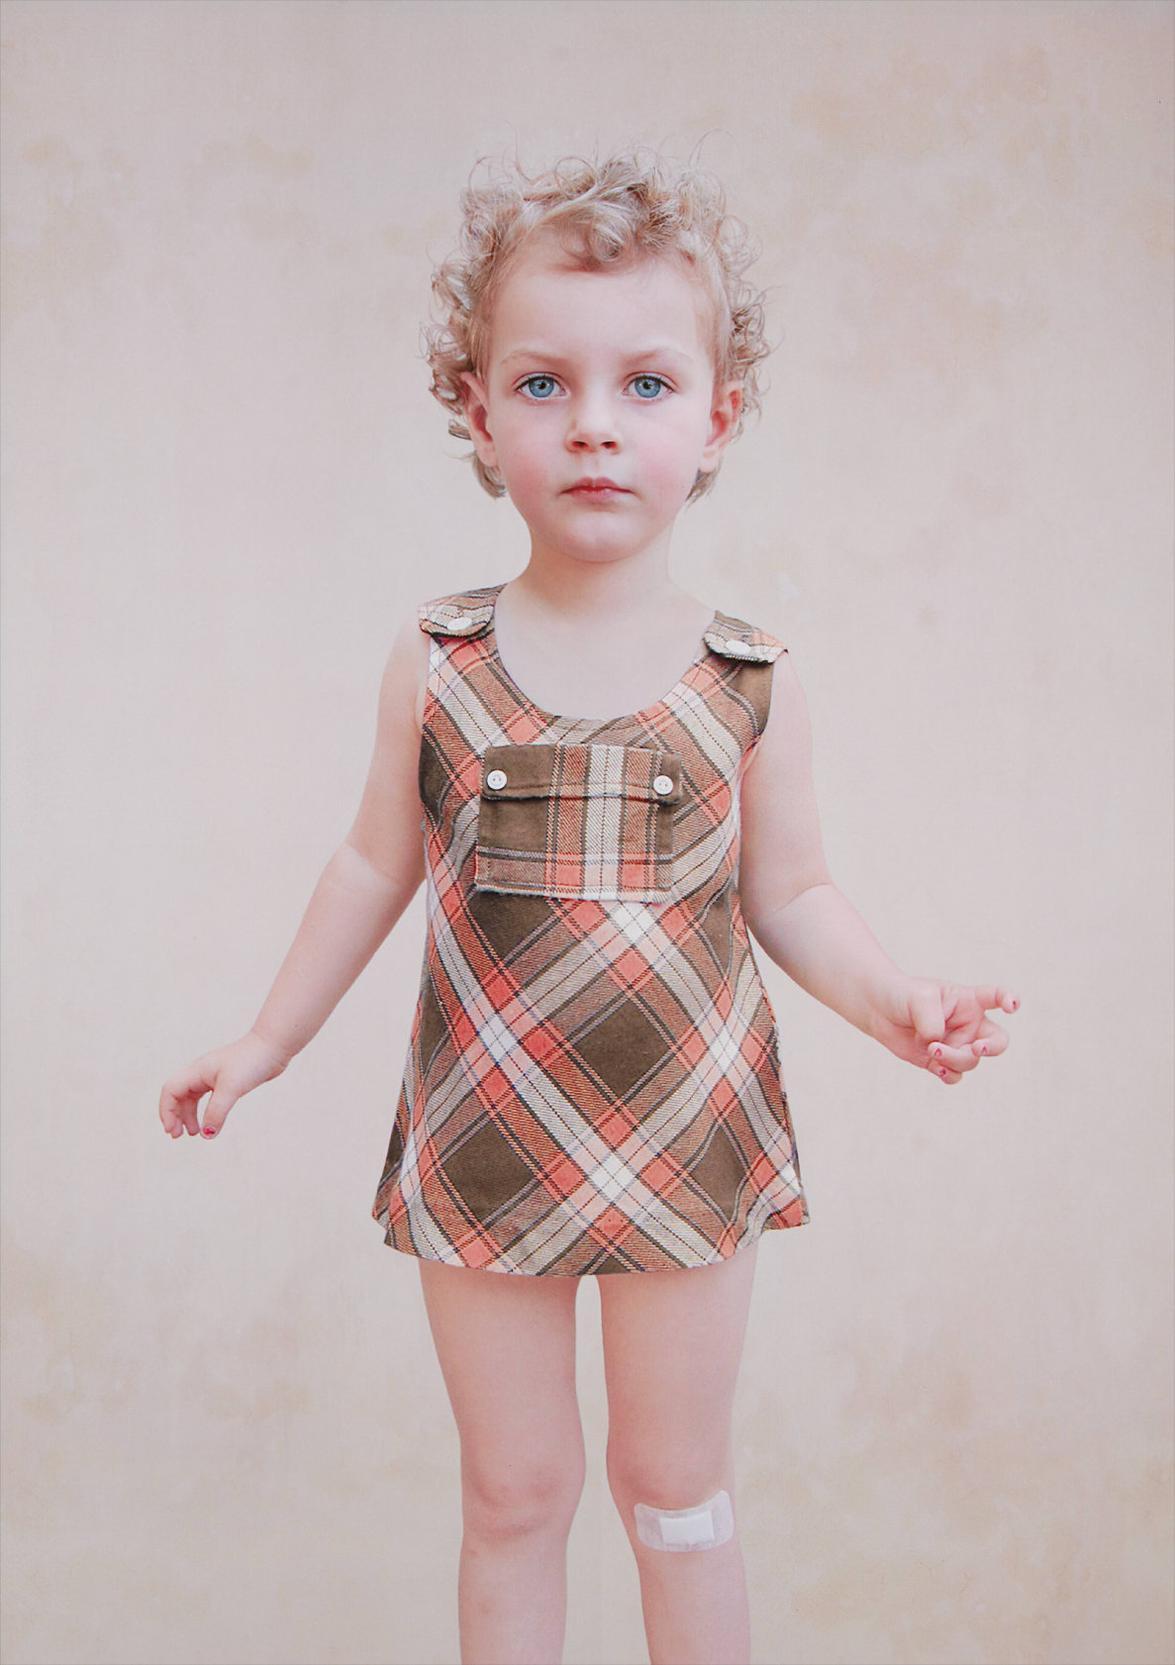 Loretta Lux-Study Of A Girl 1-2002